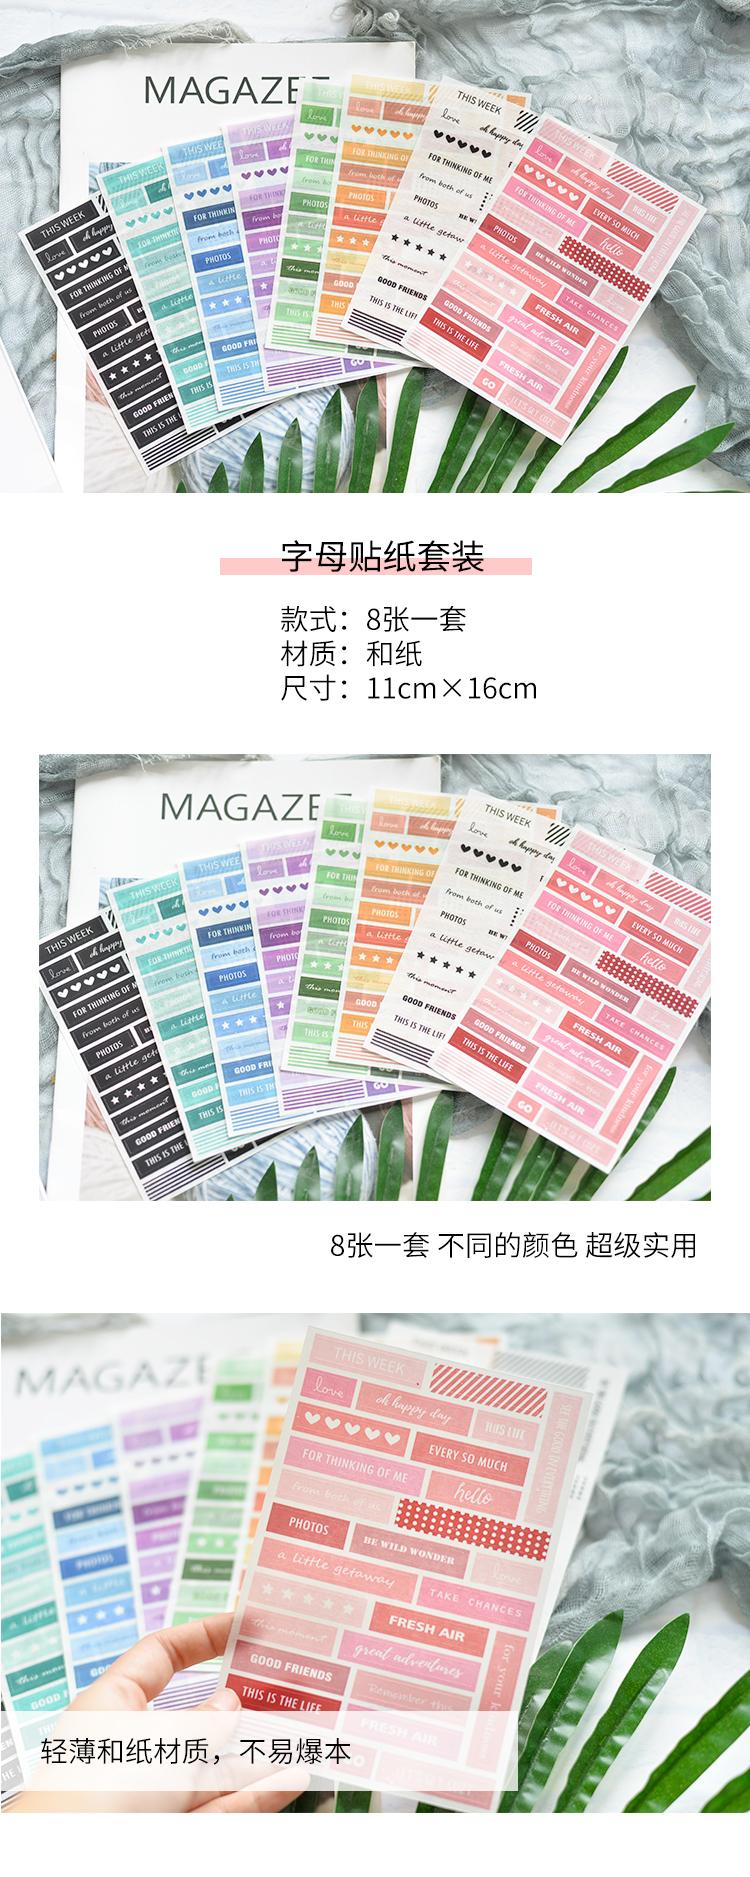 Lovedoki Creative English Sentence Sticker Kit 8 Pcs/Pack Planner Diary  Book Decorative Stickers Scrapbooking Diy Accessories